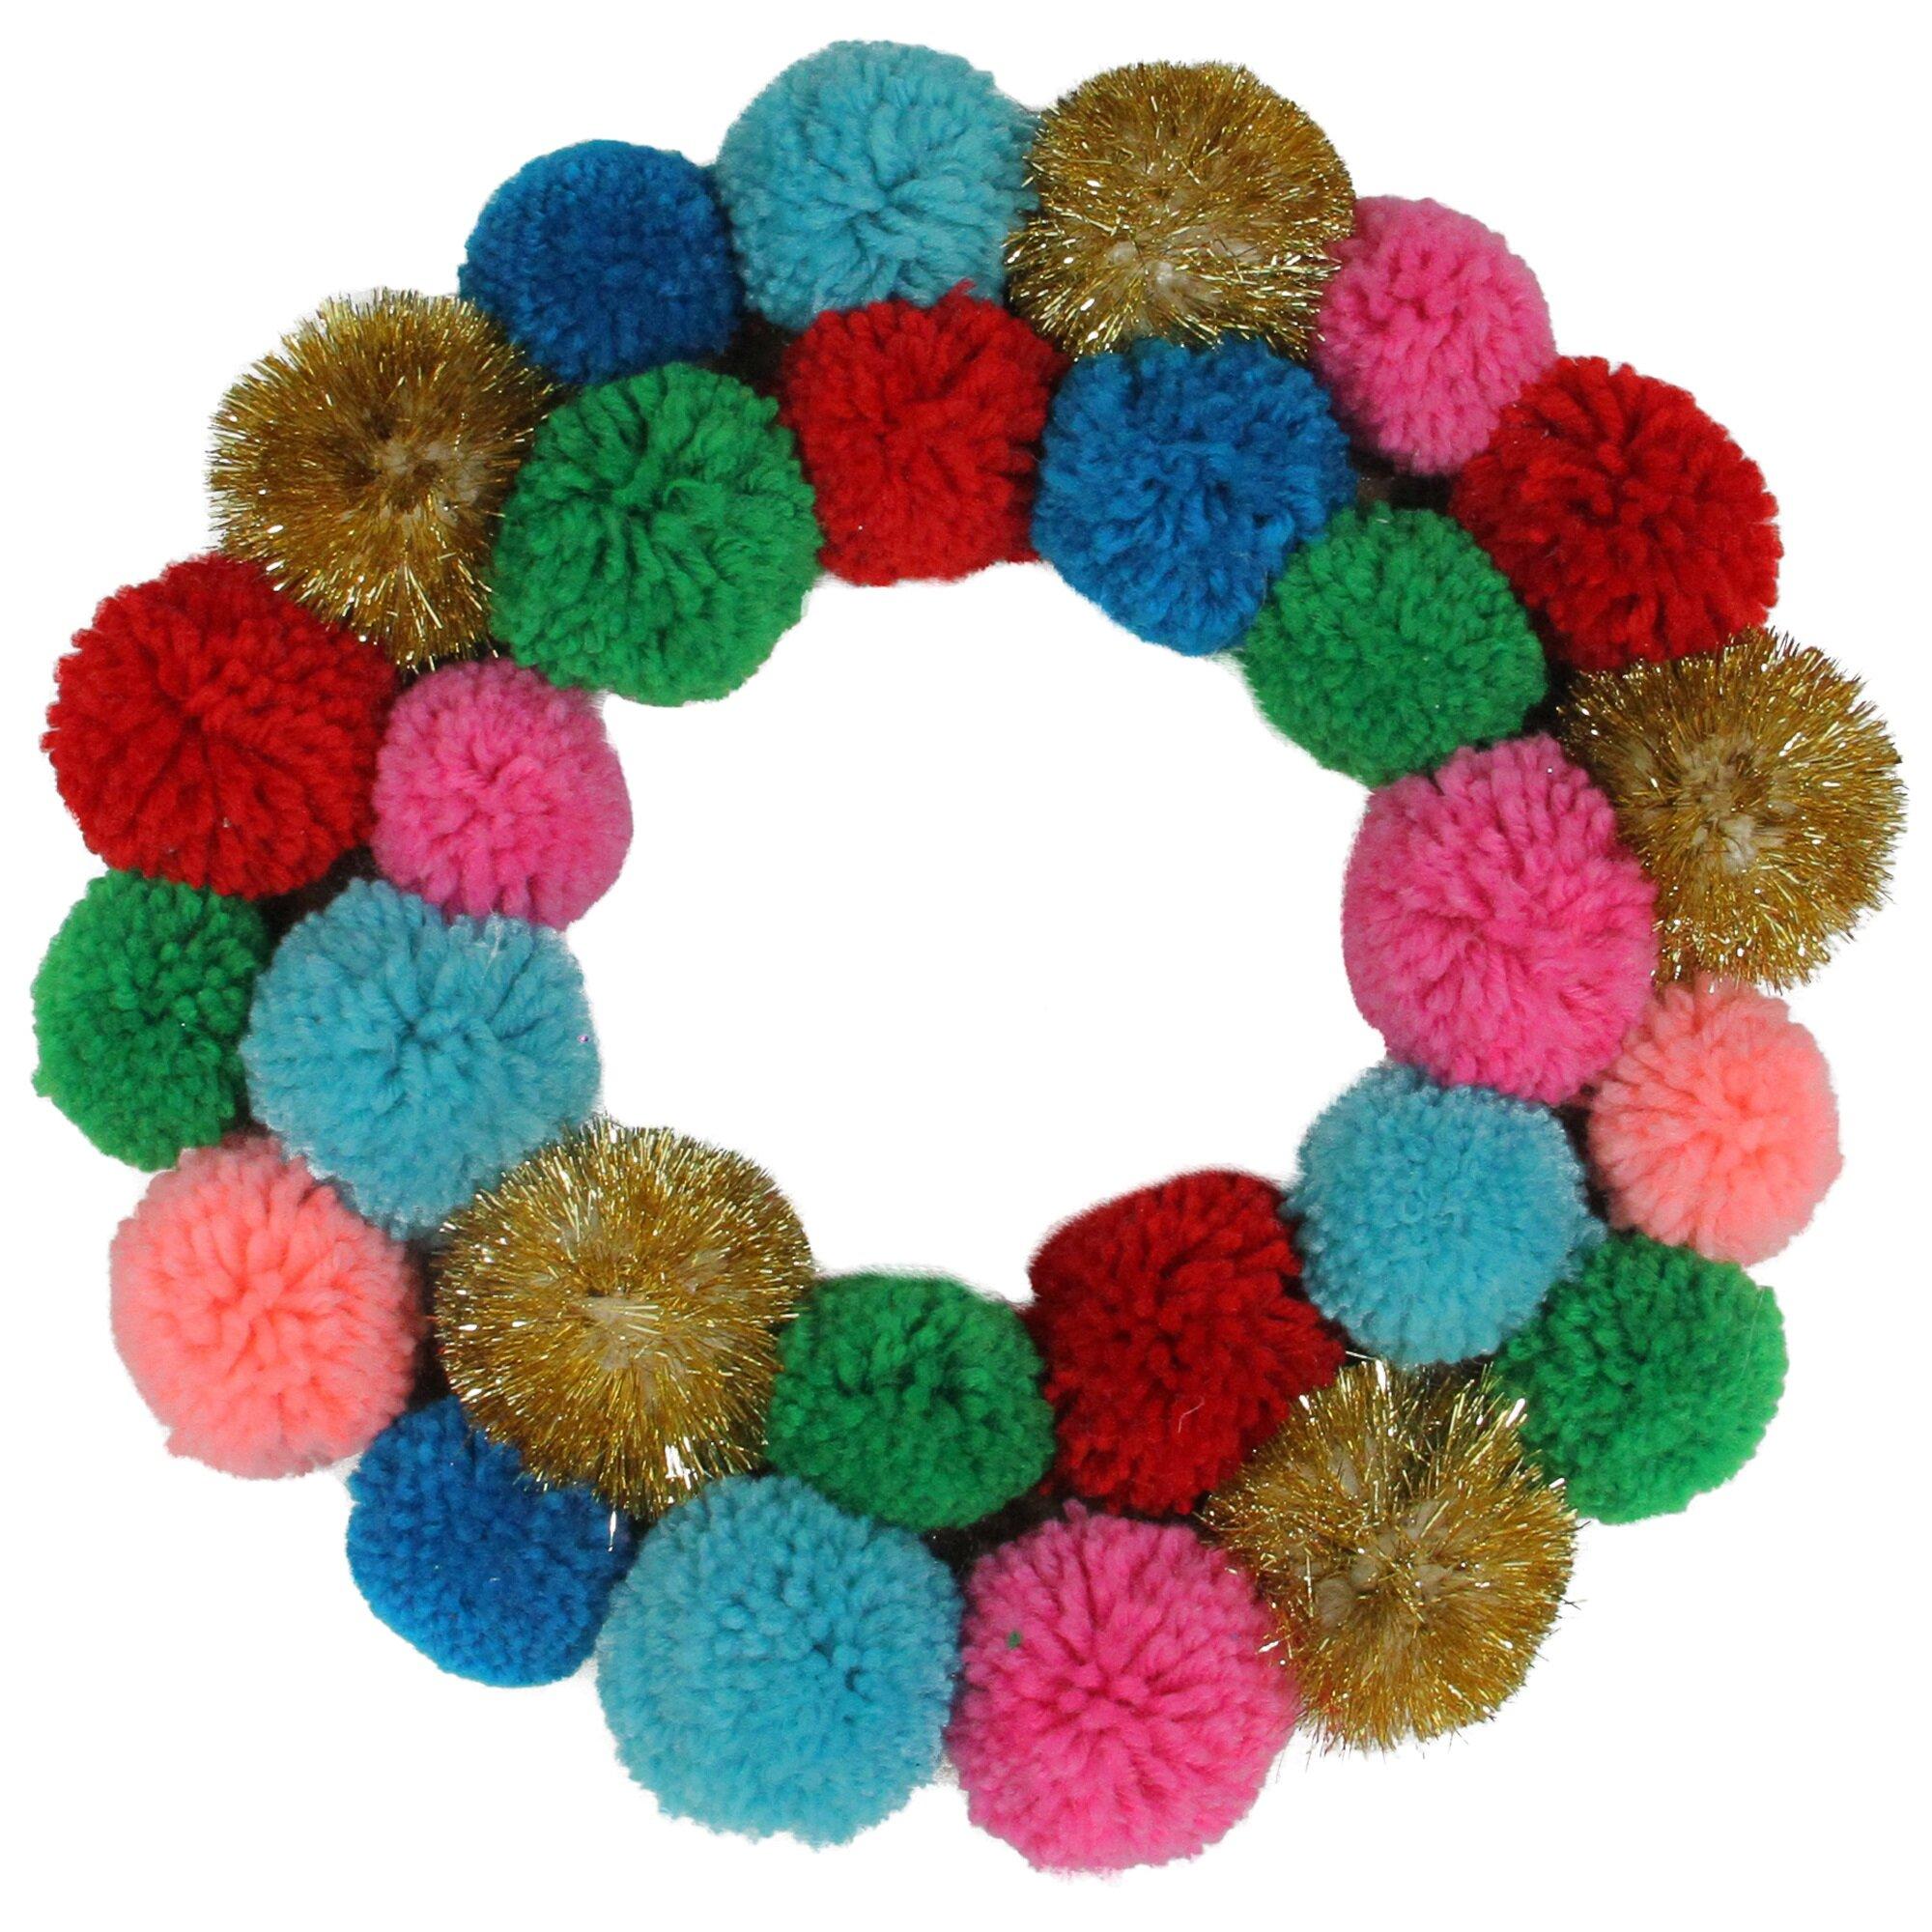 Northlight 11 5 Multi Color Bohemian Christmas Pom Pom Wreath Wayfair